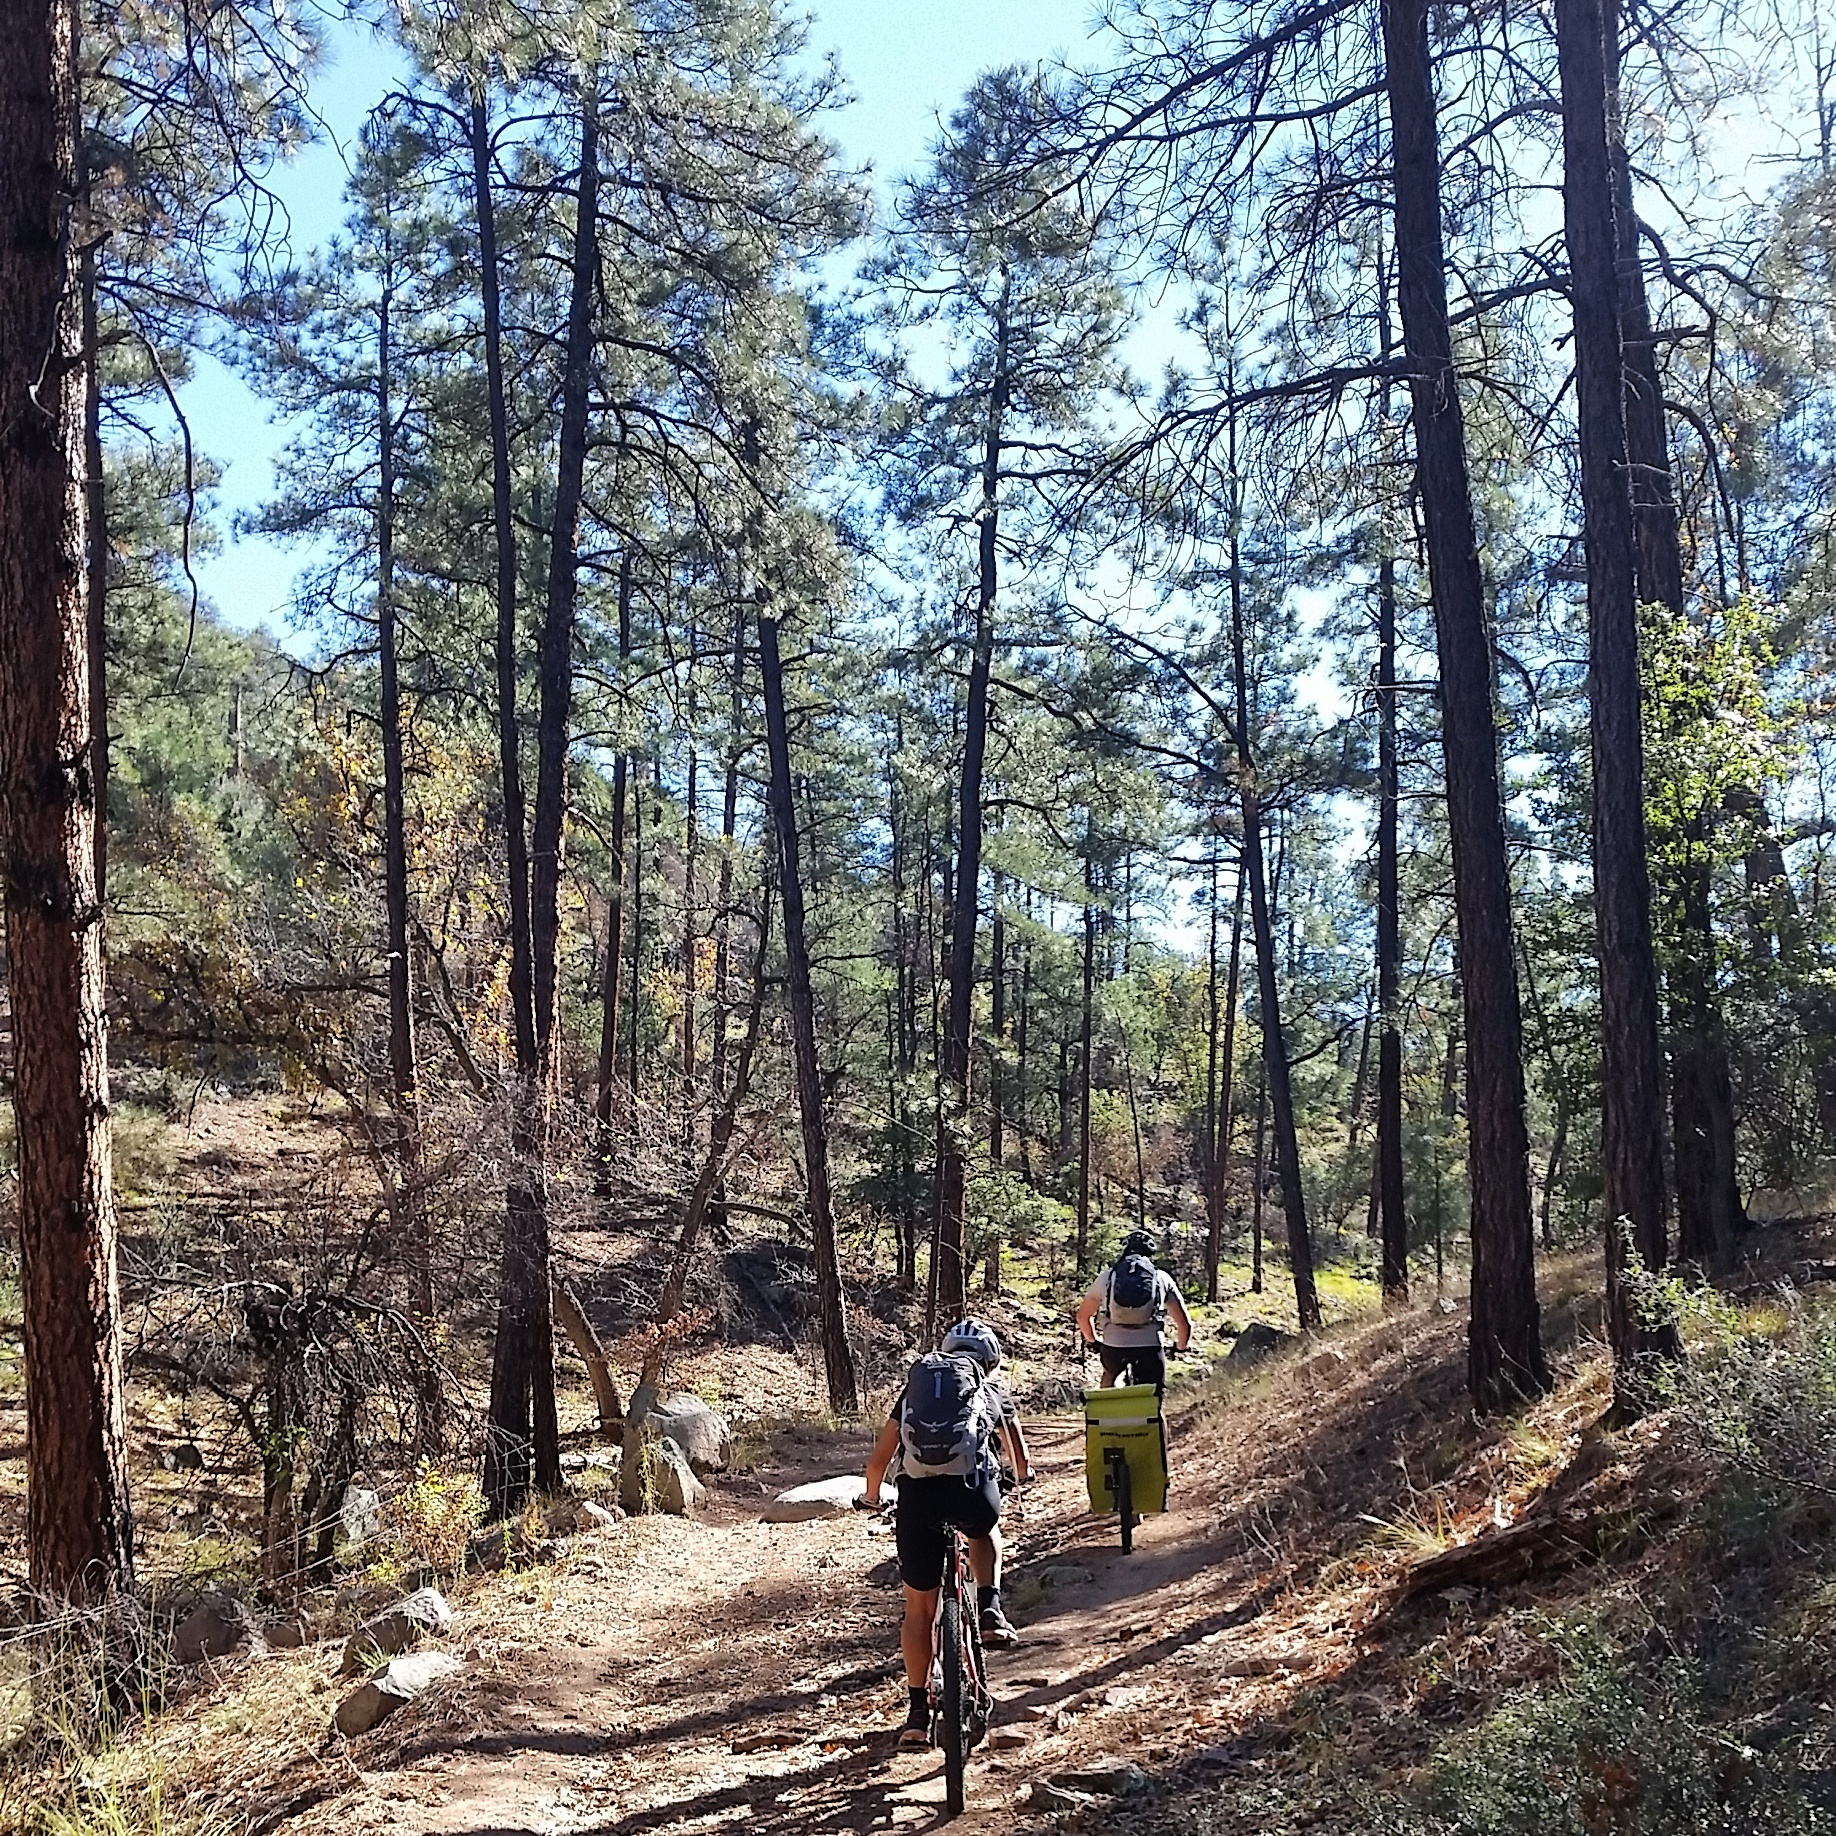 Enjoying a small climb among the pines